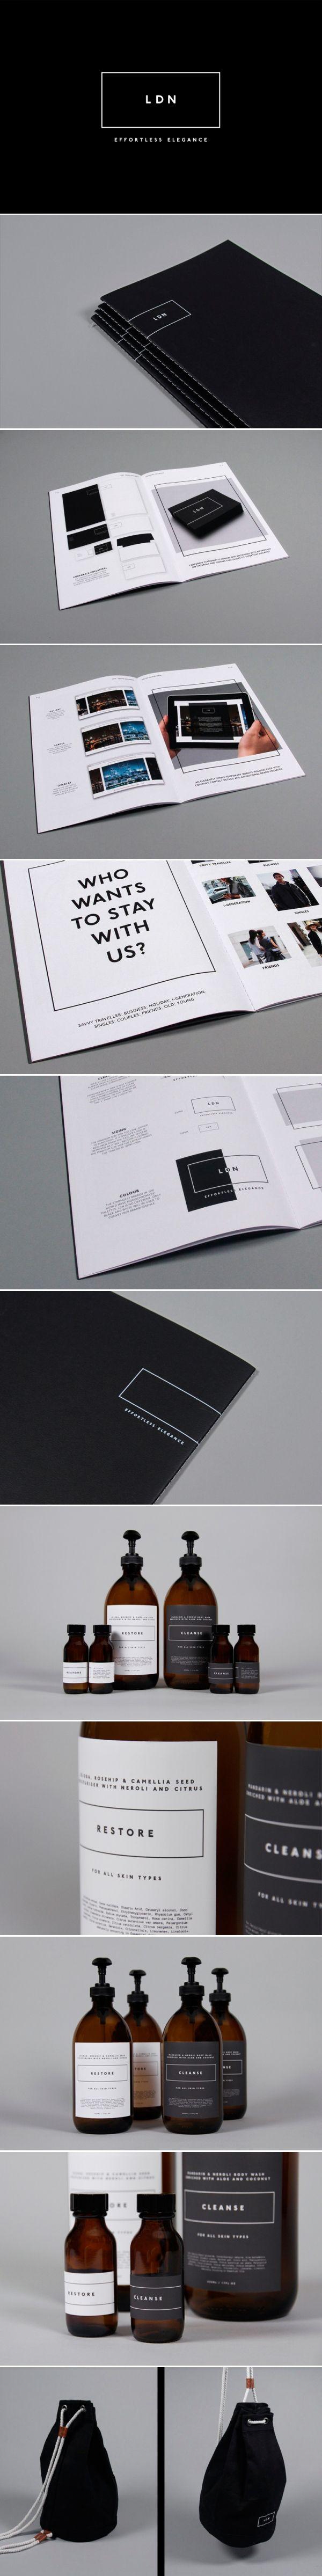 Presentation. LDN Hotel by Blacksheep